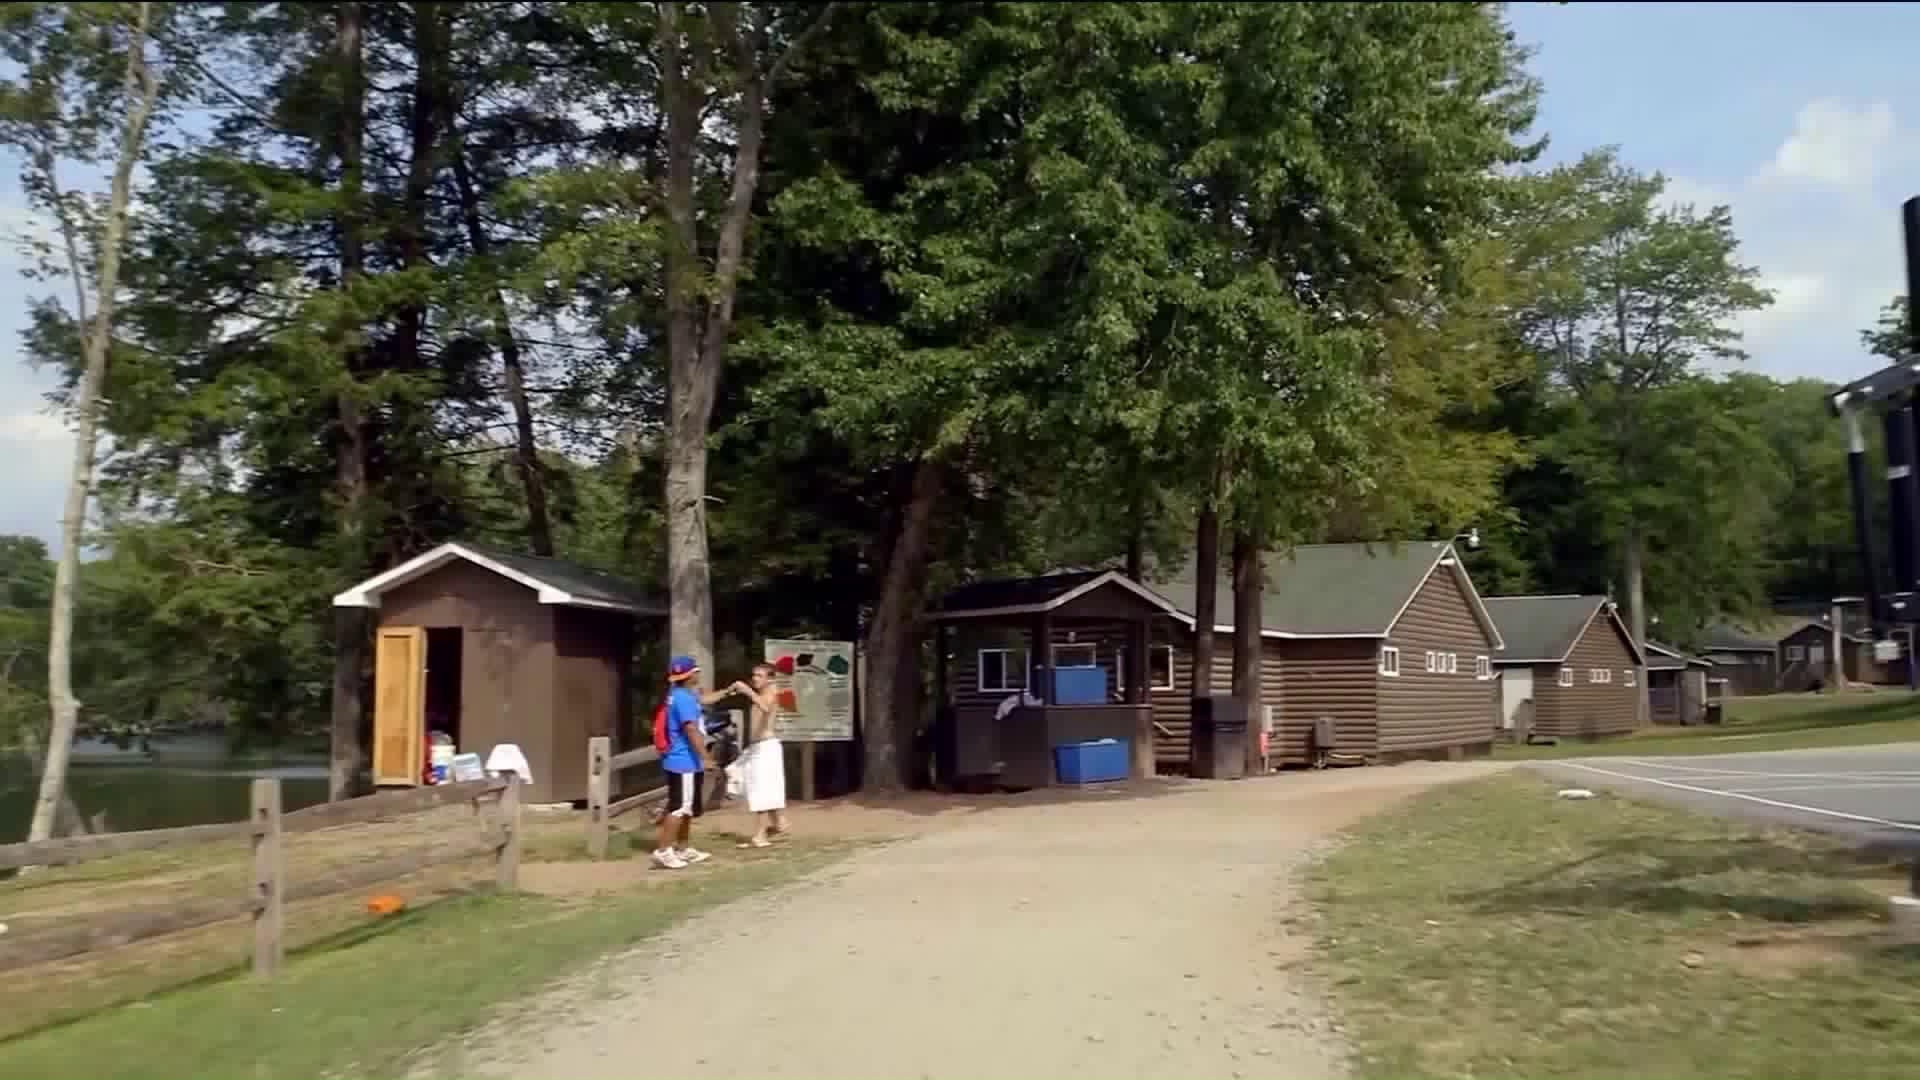 Area summer camps adjust for coronavirus